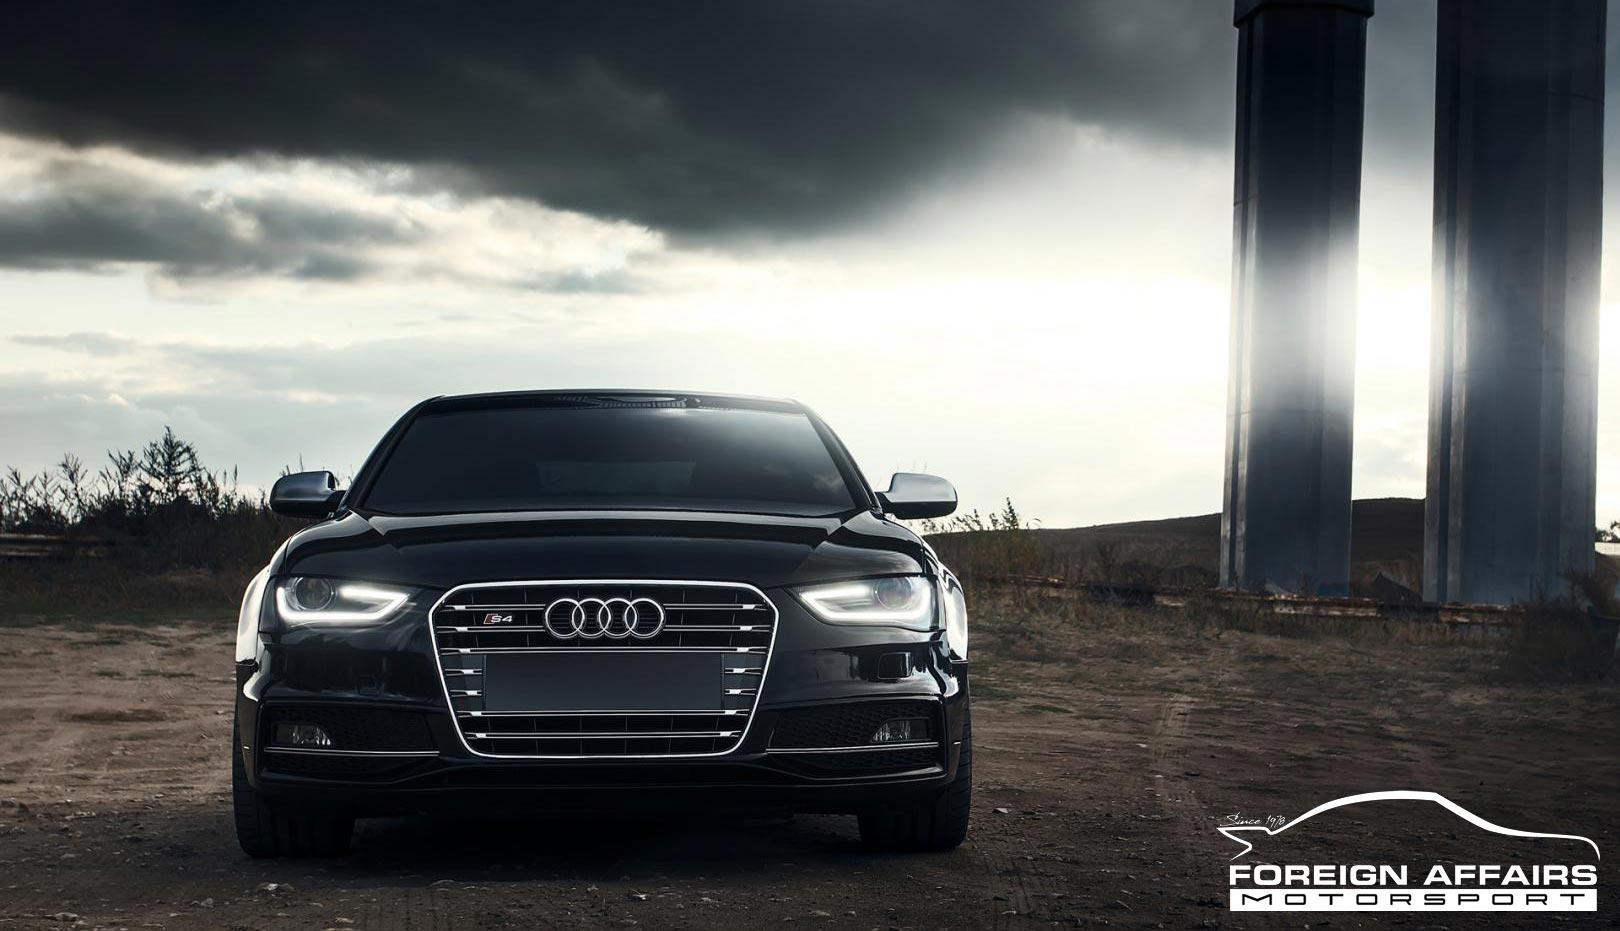 Audi body kits